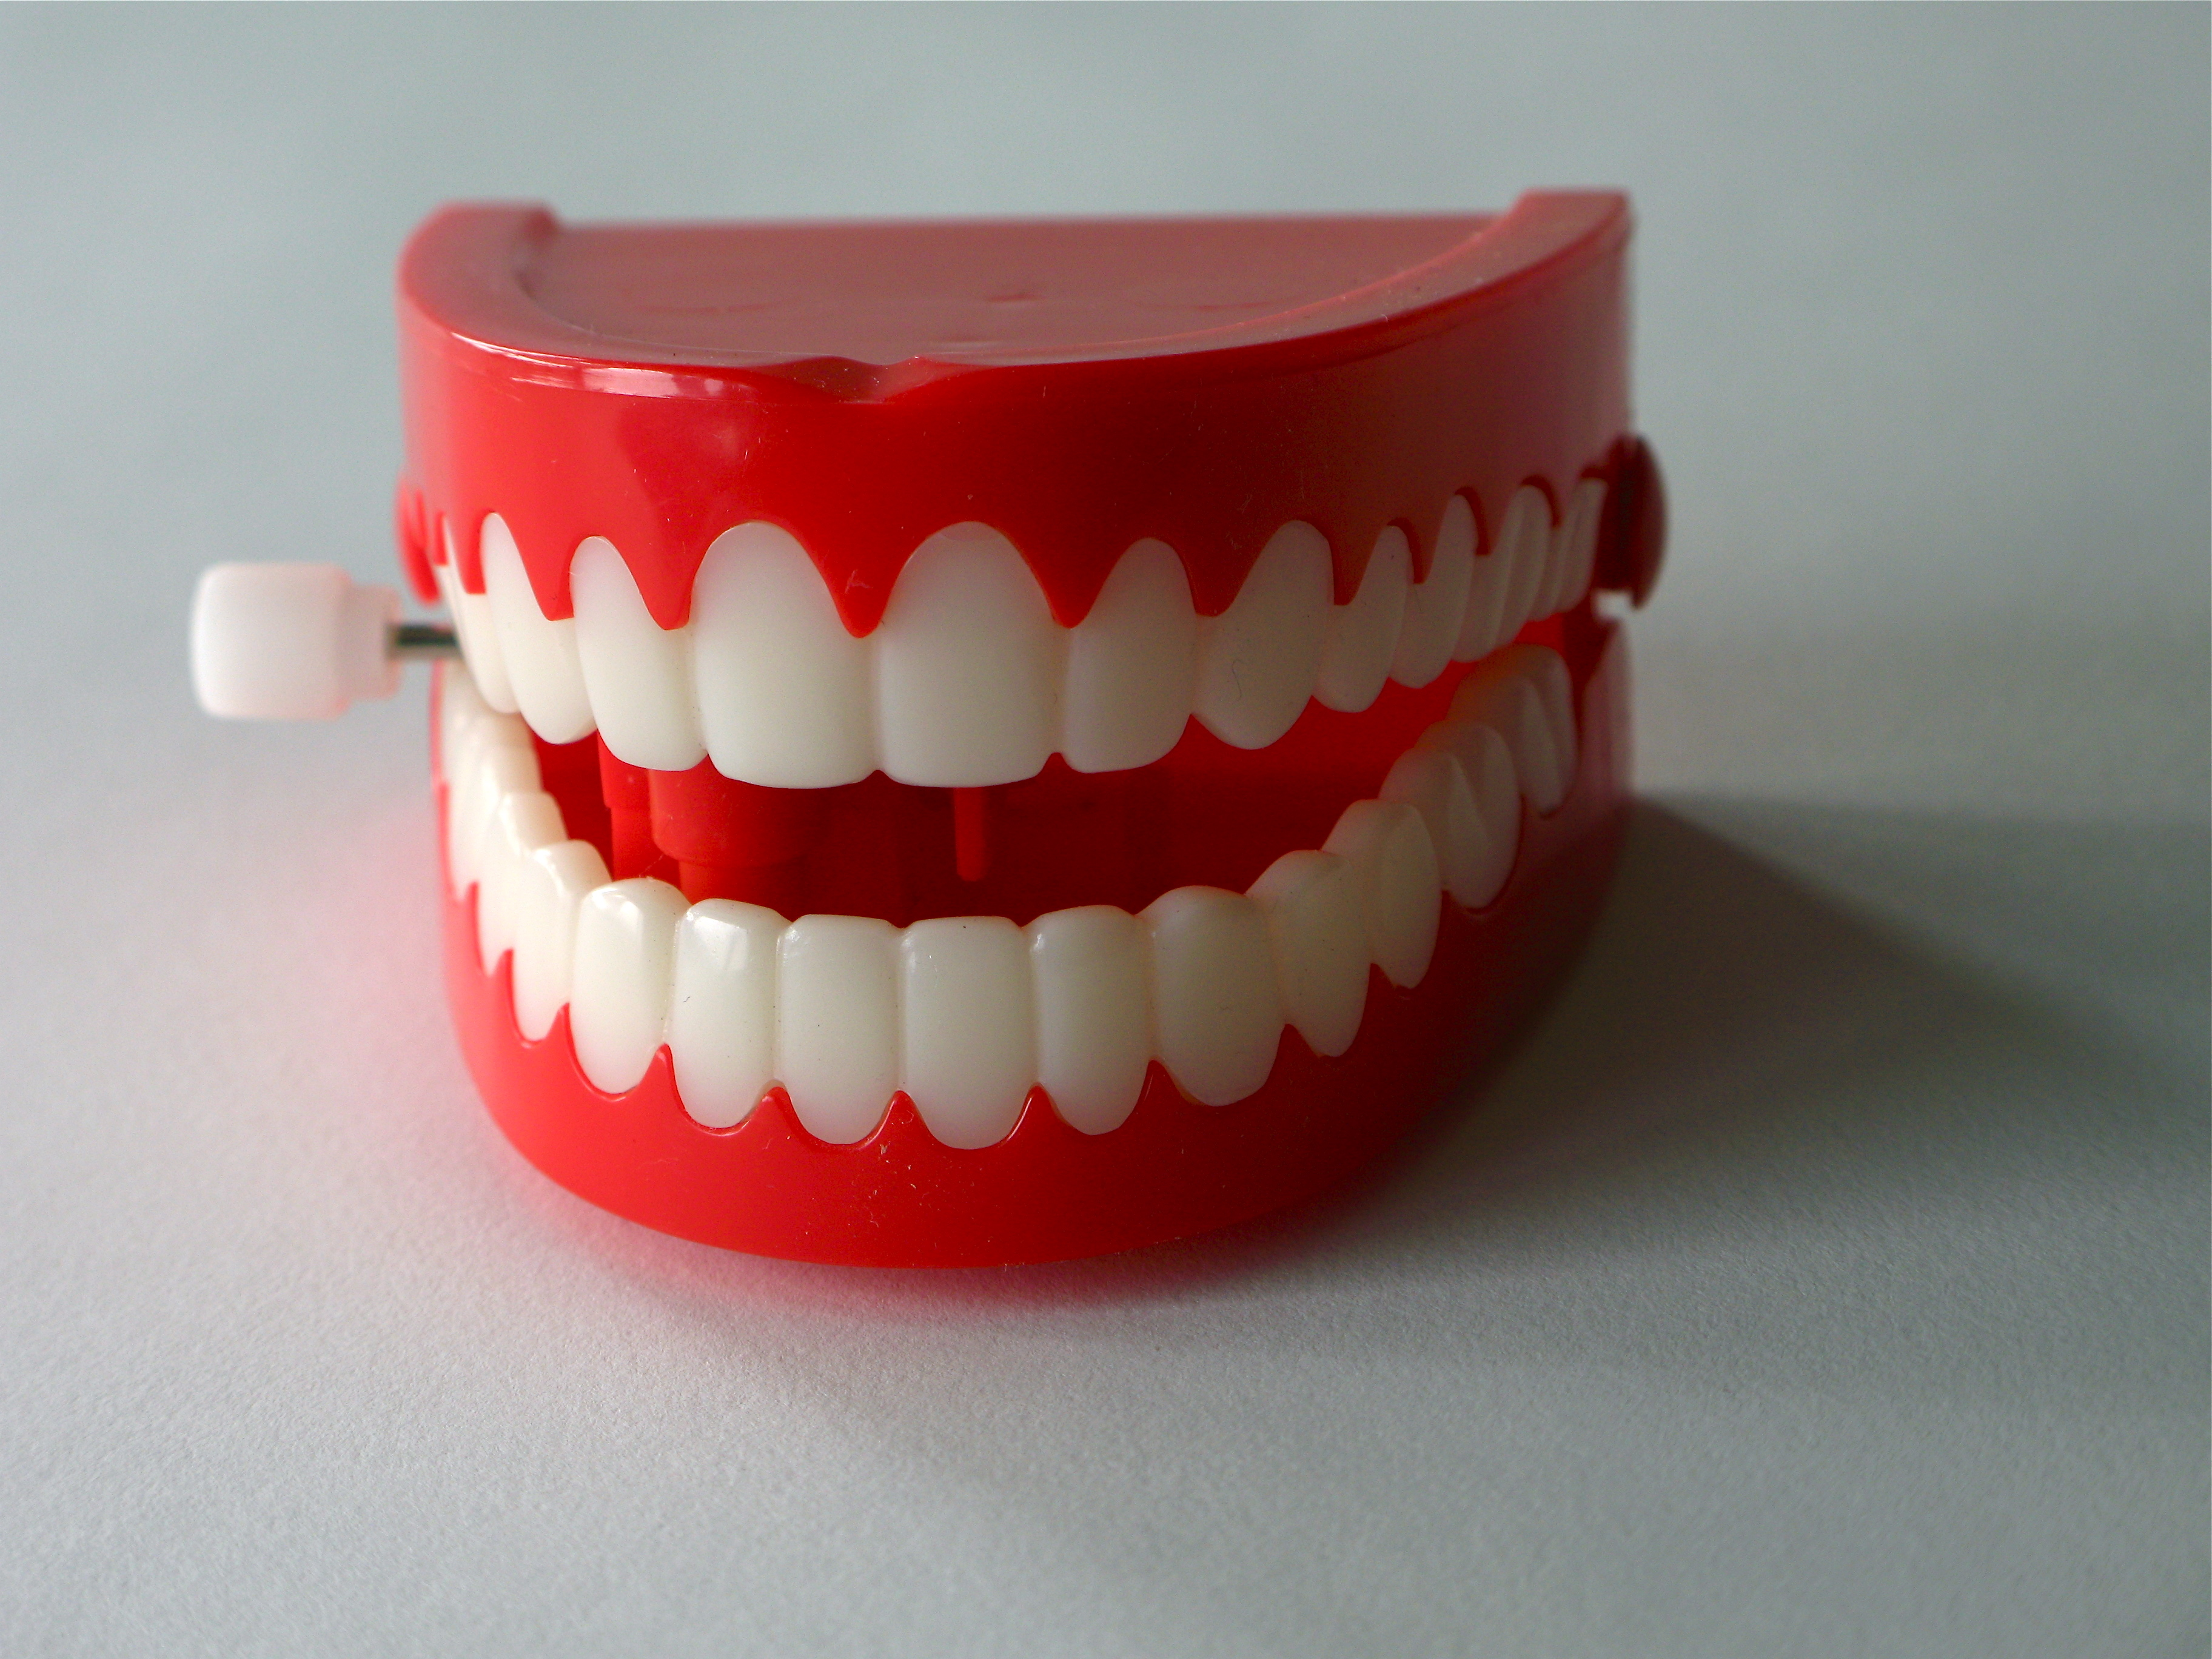 El bruxismo, ¿la enfermedad dental del S.XXI?